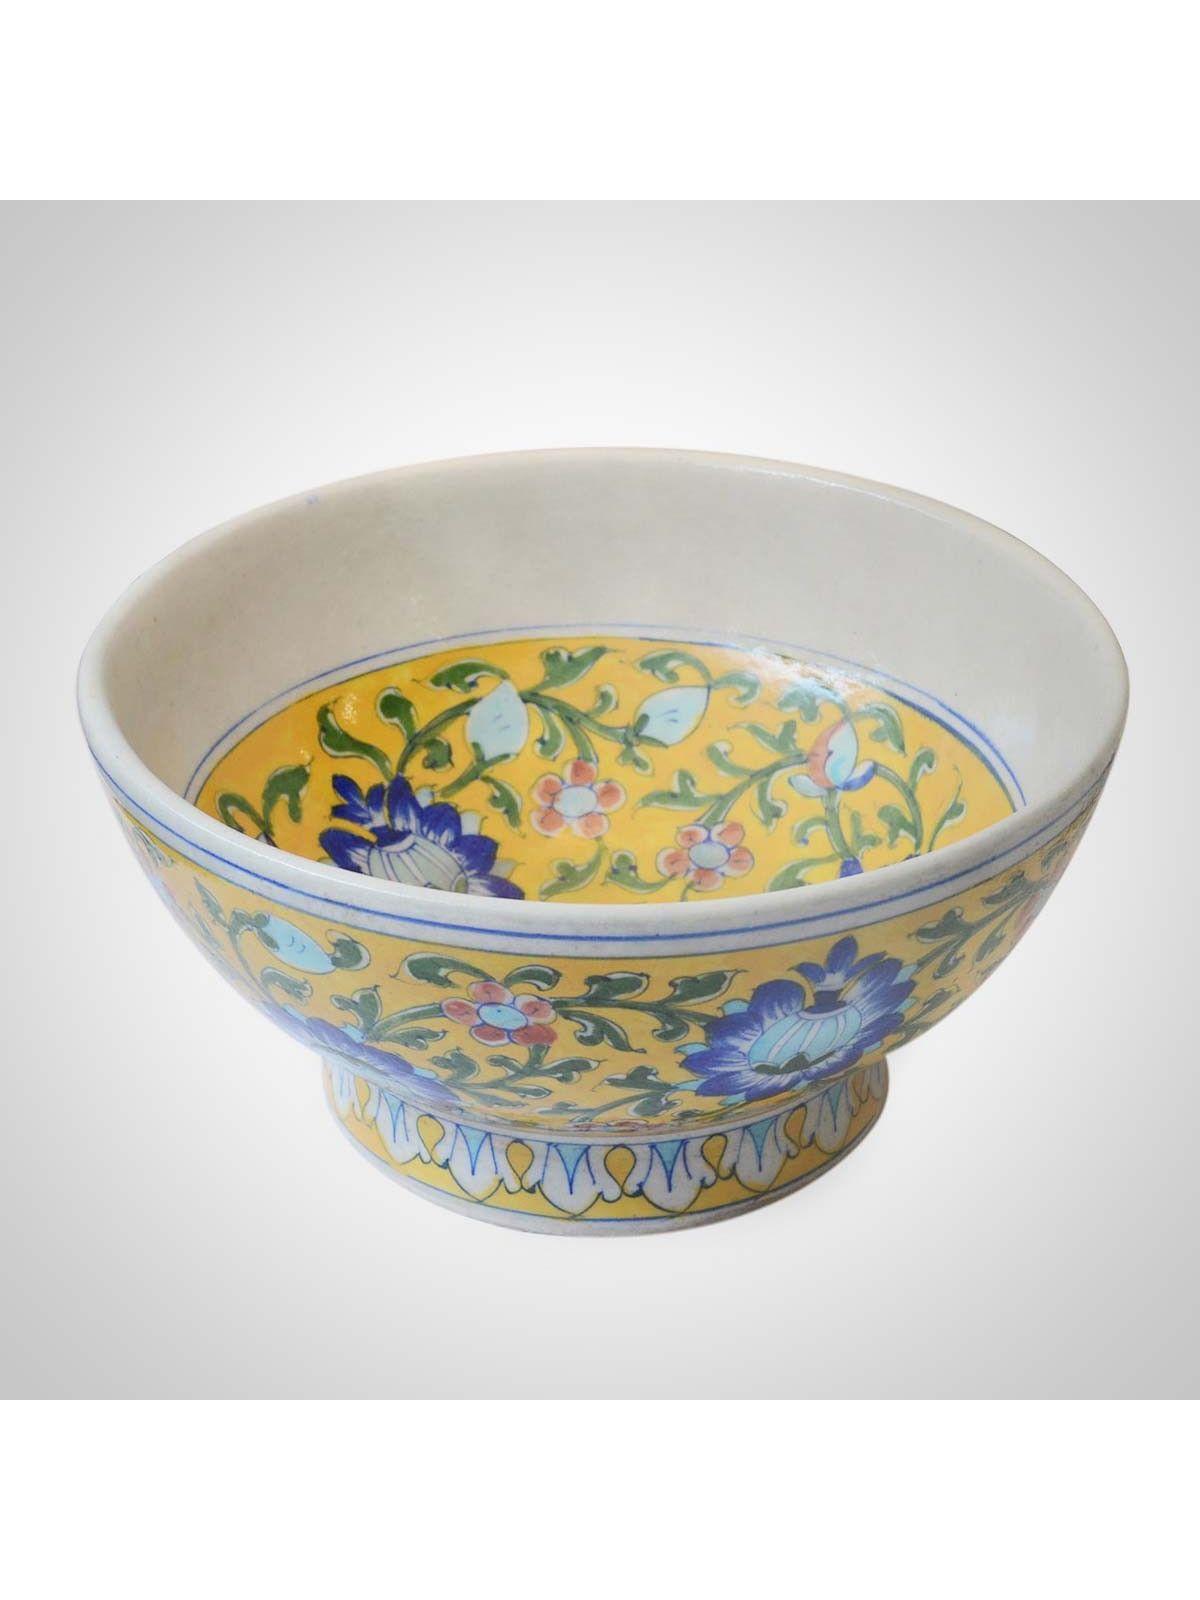 Yellow Ceramic Bowl - 10 Inches Diameter